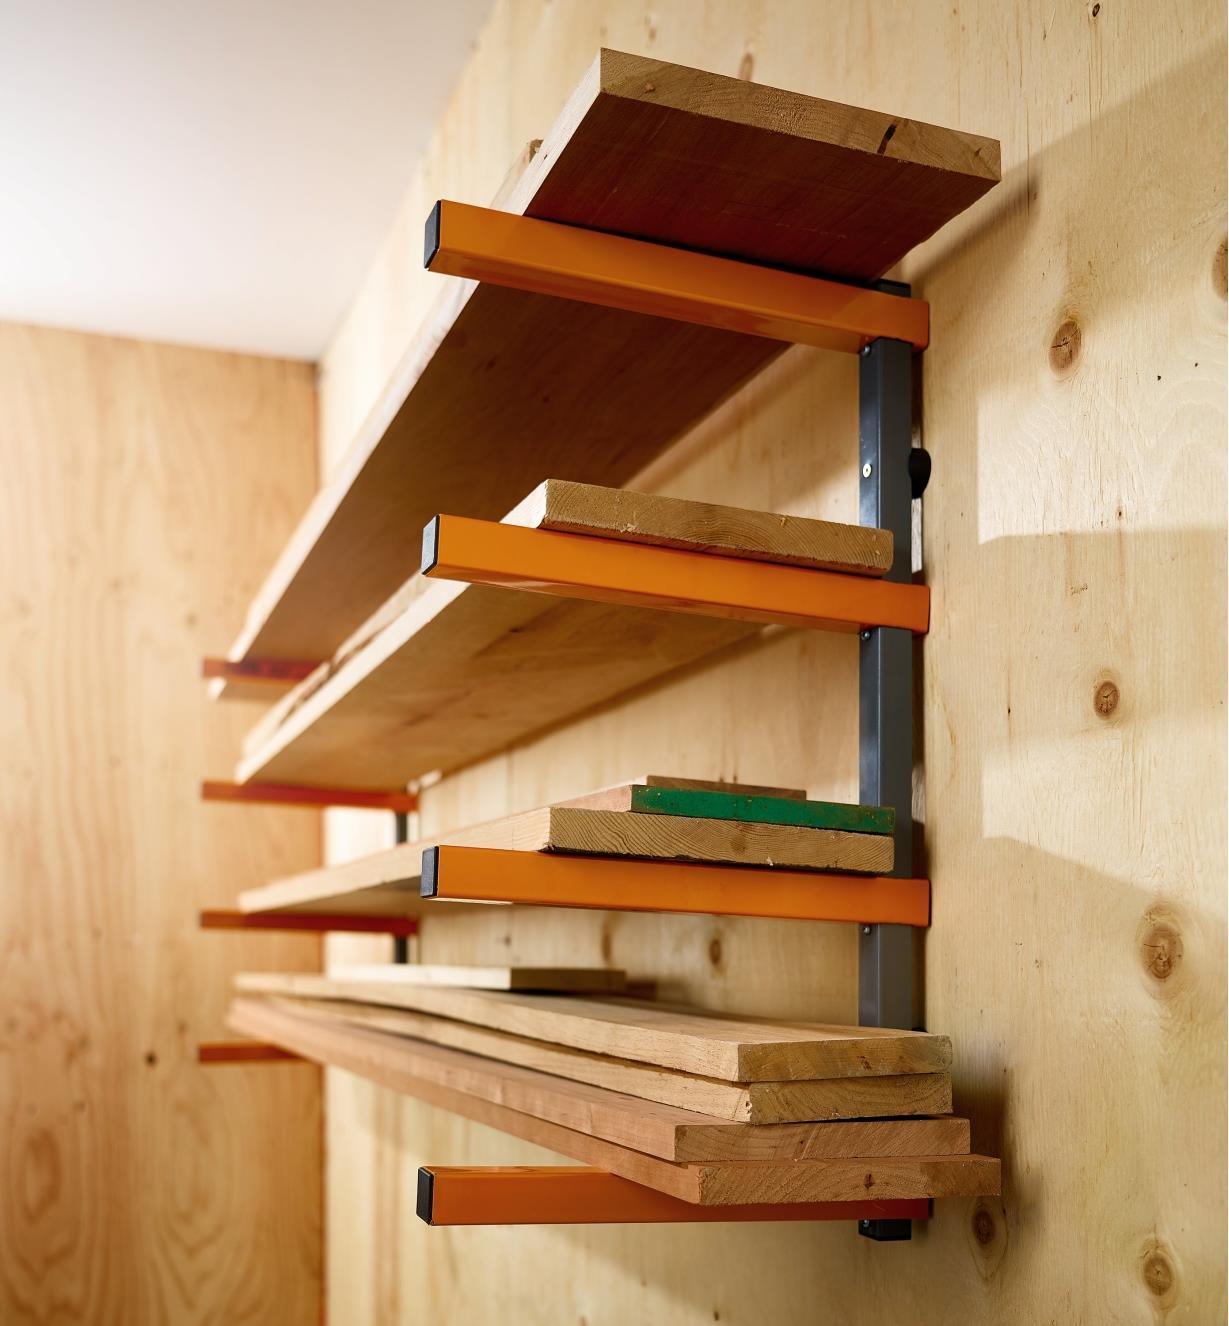 84K4107 - Bora Four-Shelf Lumber Rack